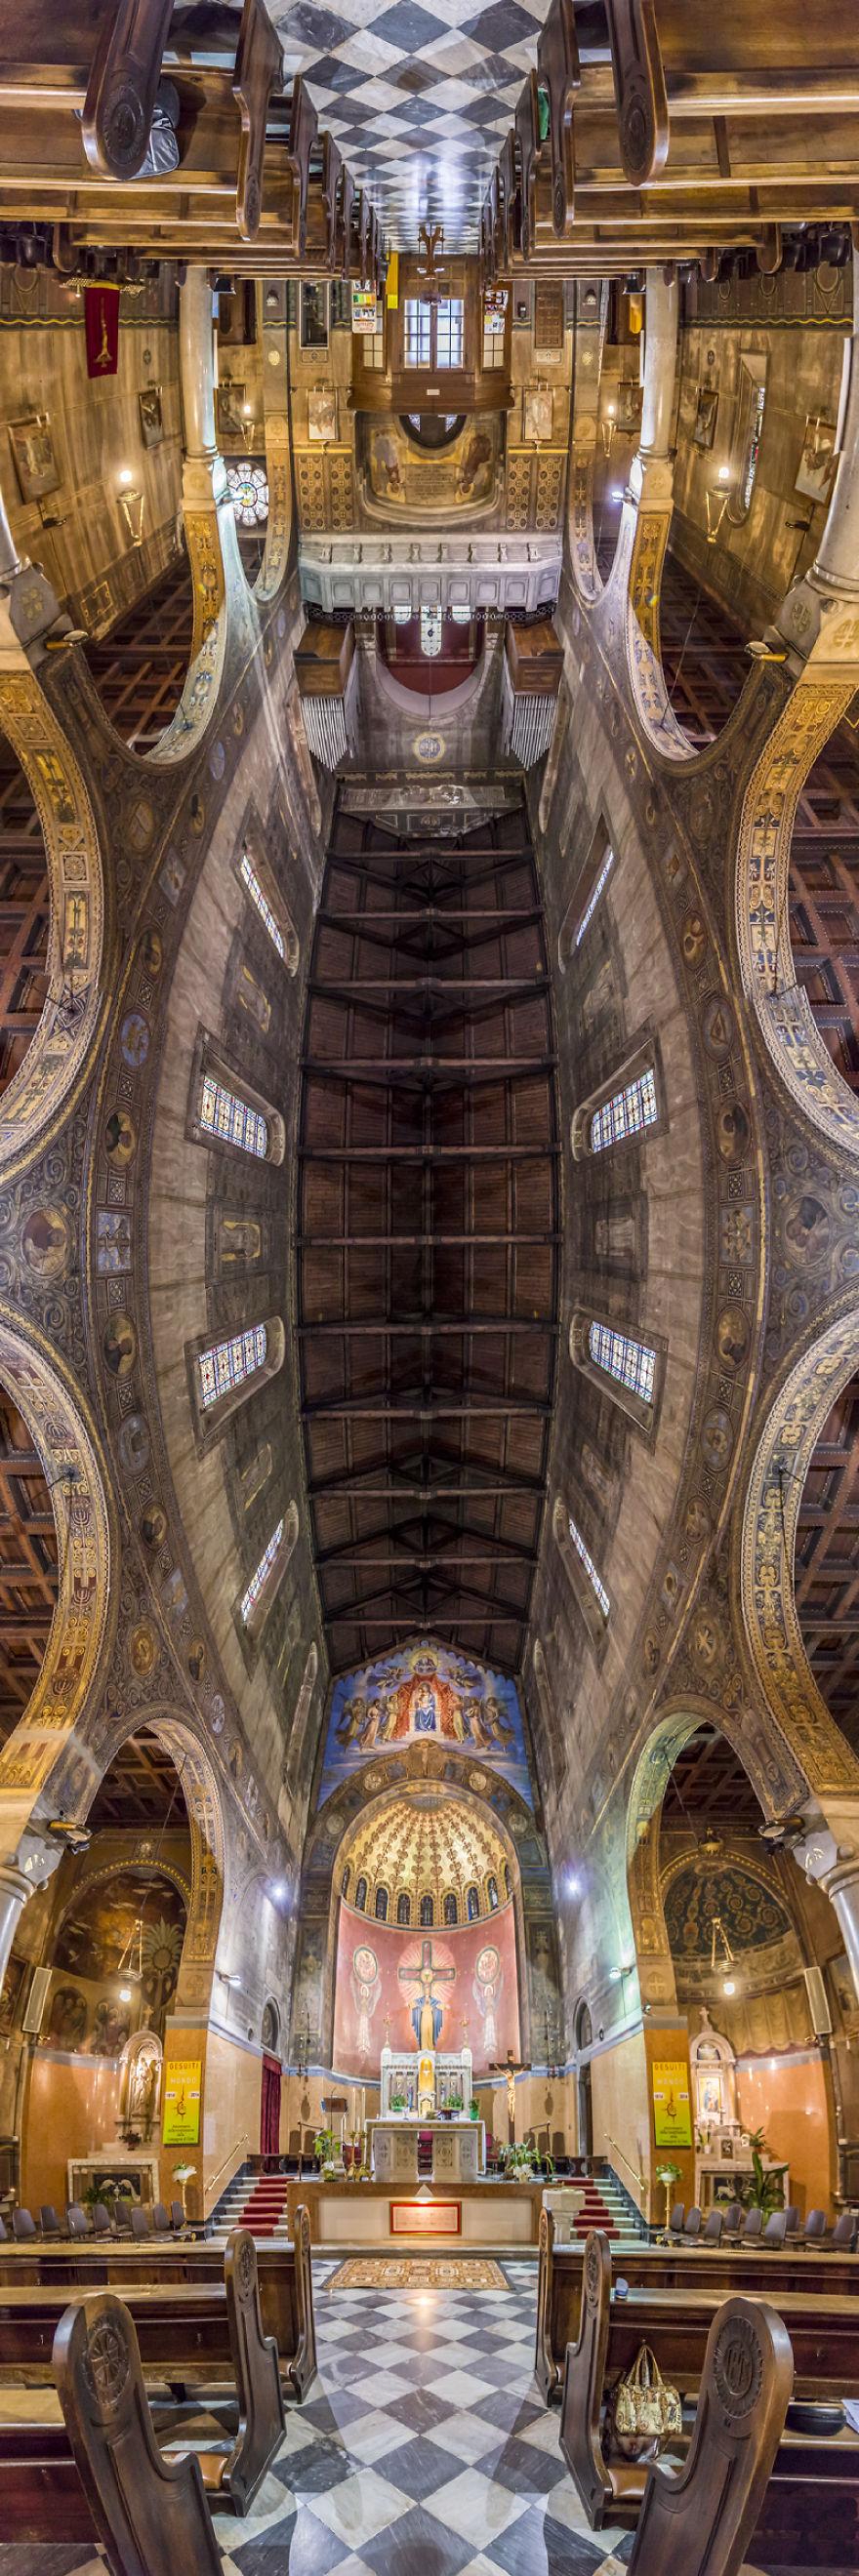 catedrales fotografiadas vertical 8